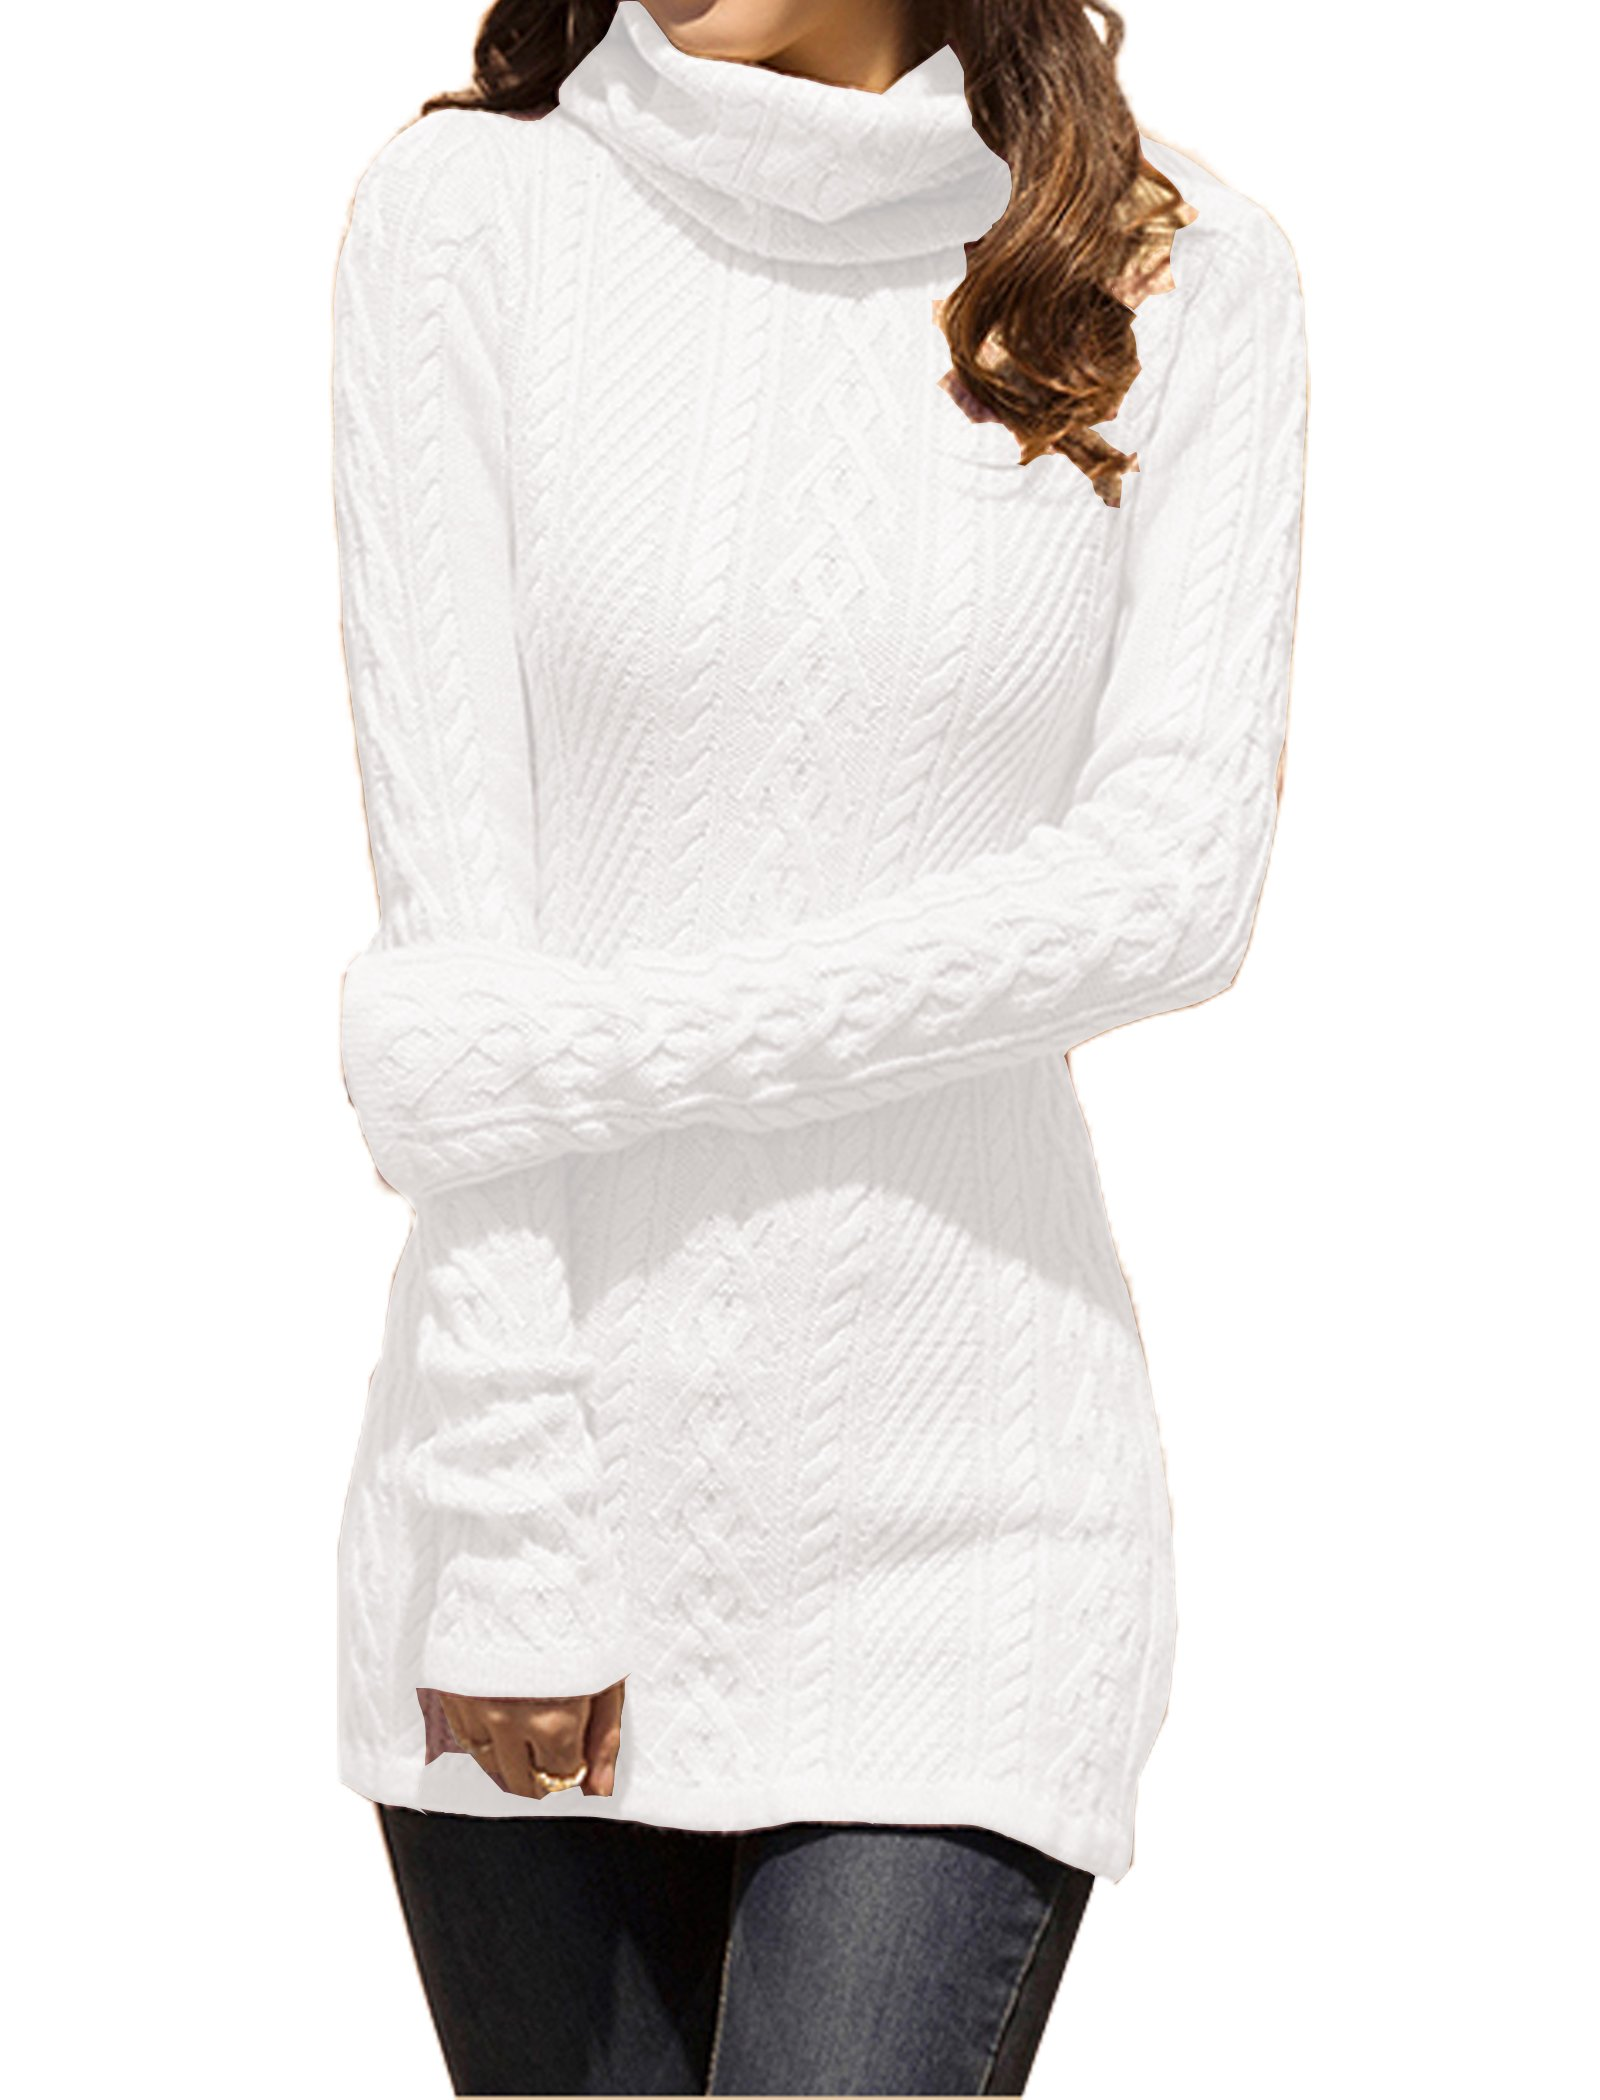 v28 Women Polo Neck Knit Stretchable Elasticity Long Sleeve Slim Sweater Jumper (US Size 12-16, White)